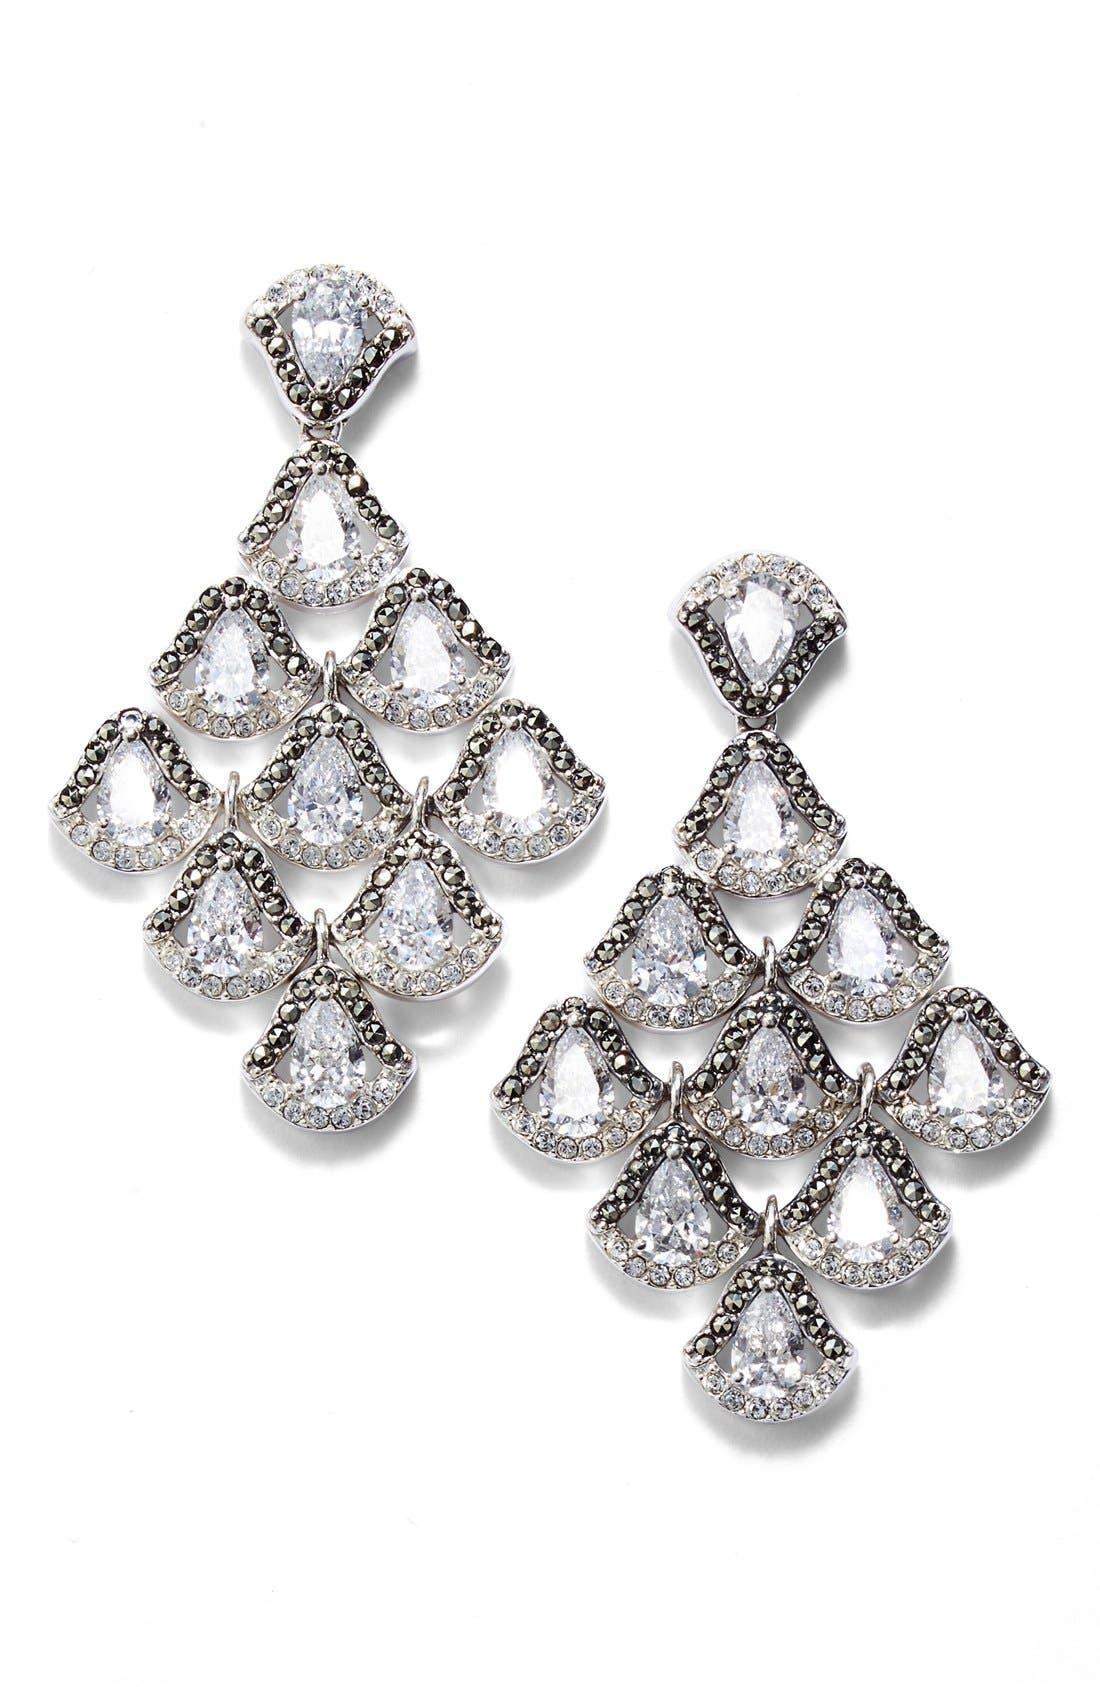 Semiprecious Stone Chandelier Earrings,                             Main thumbnail 1, color,                             SILVER